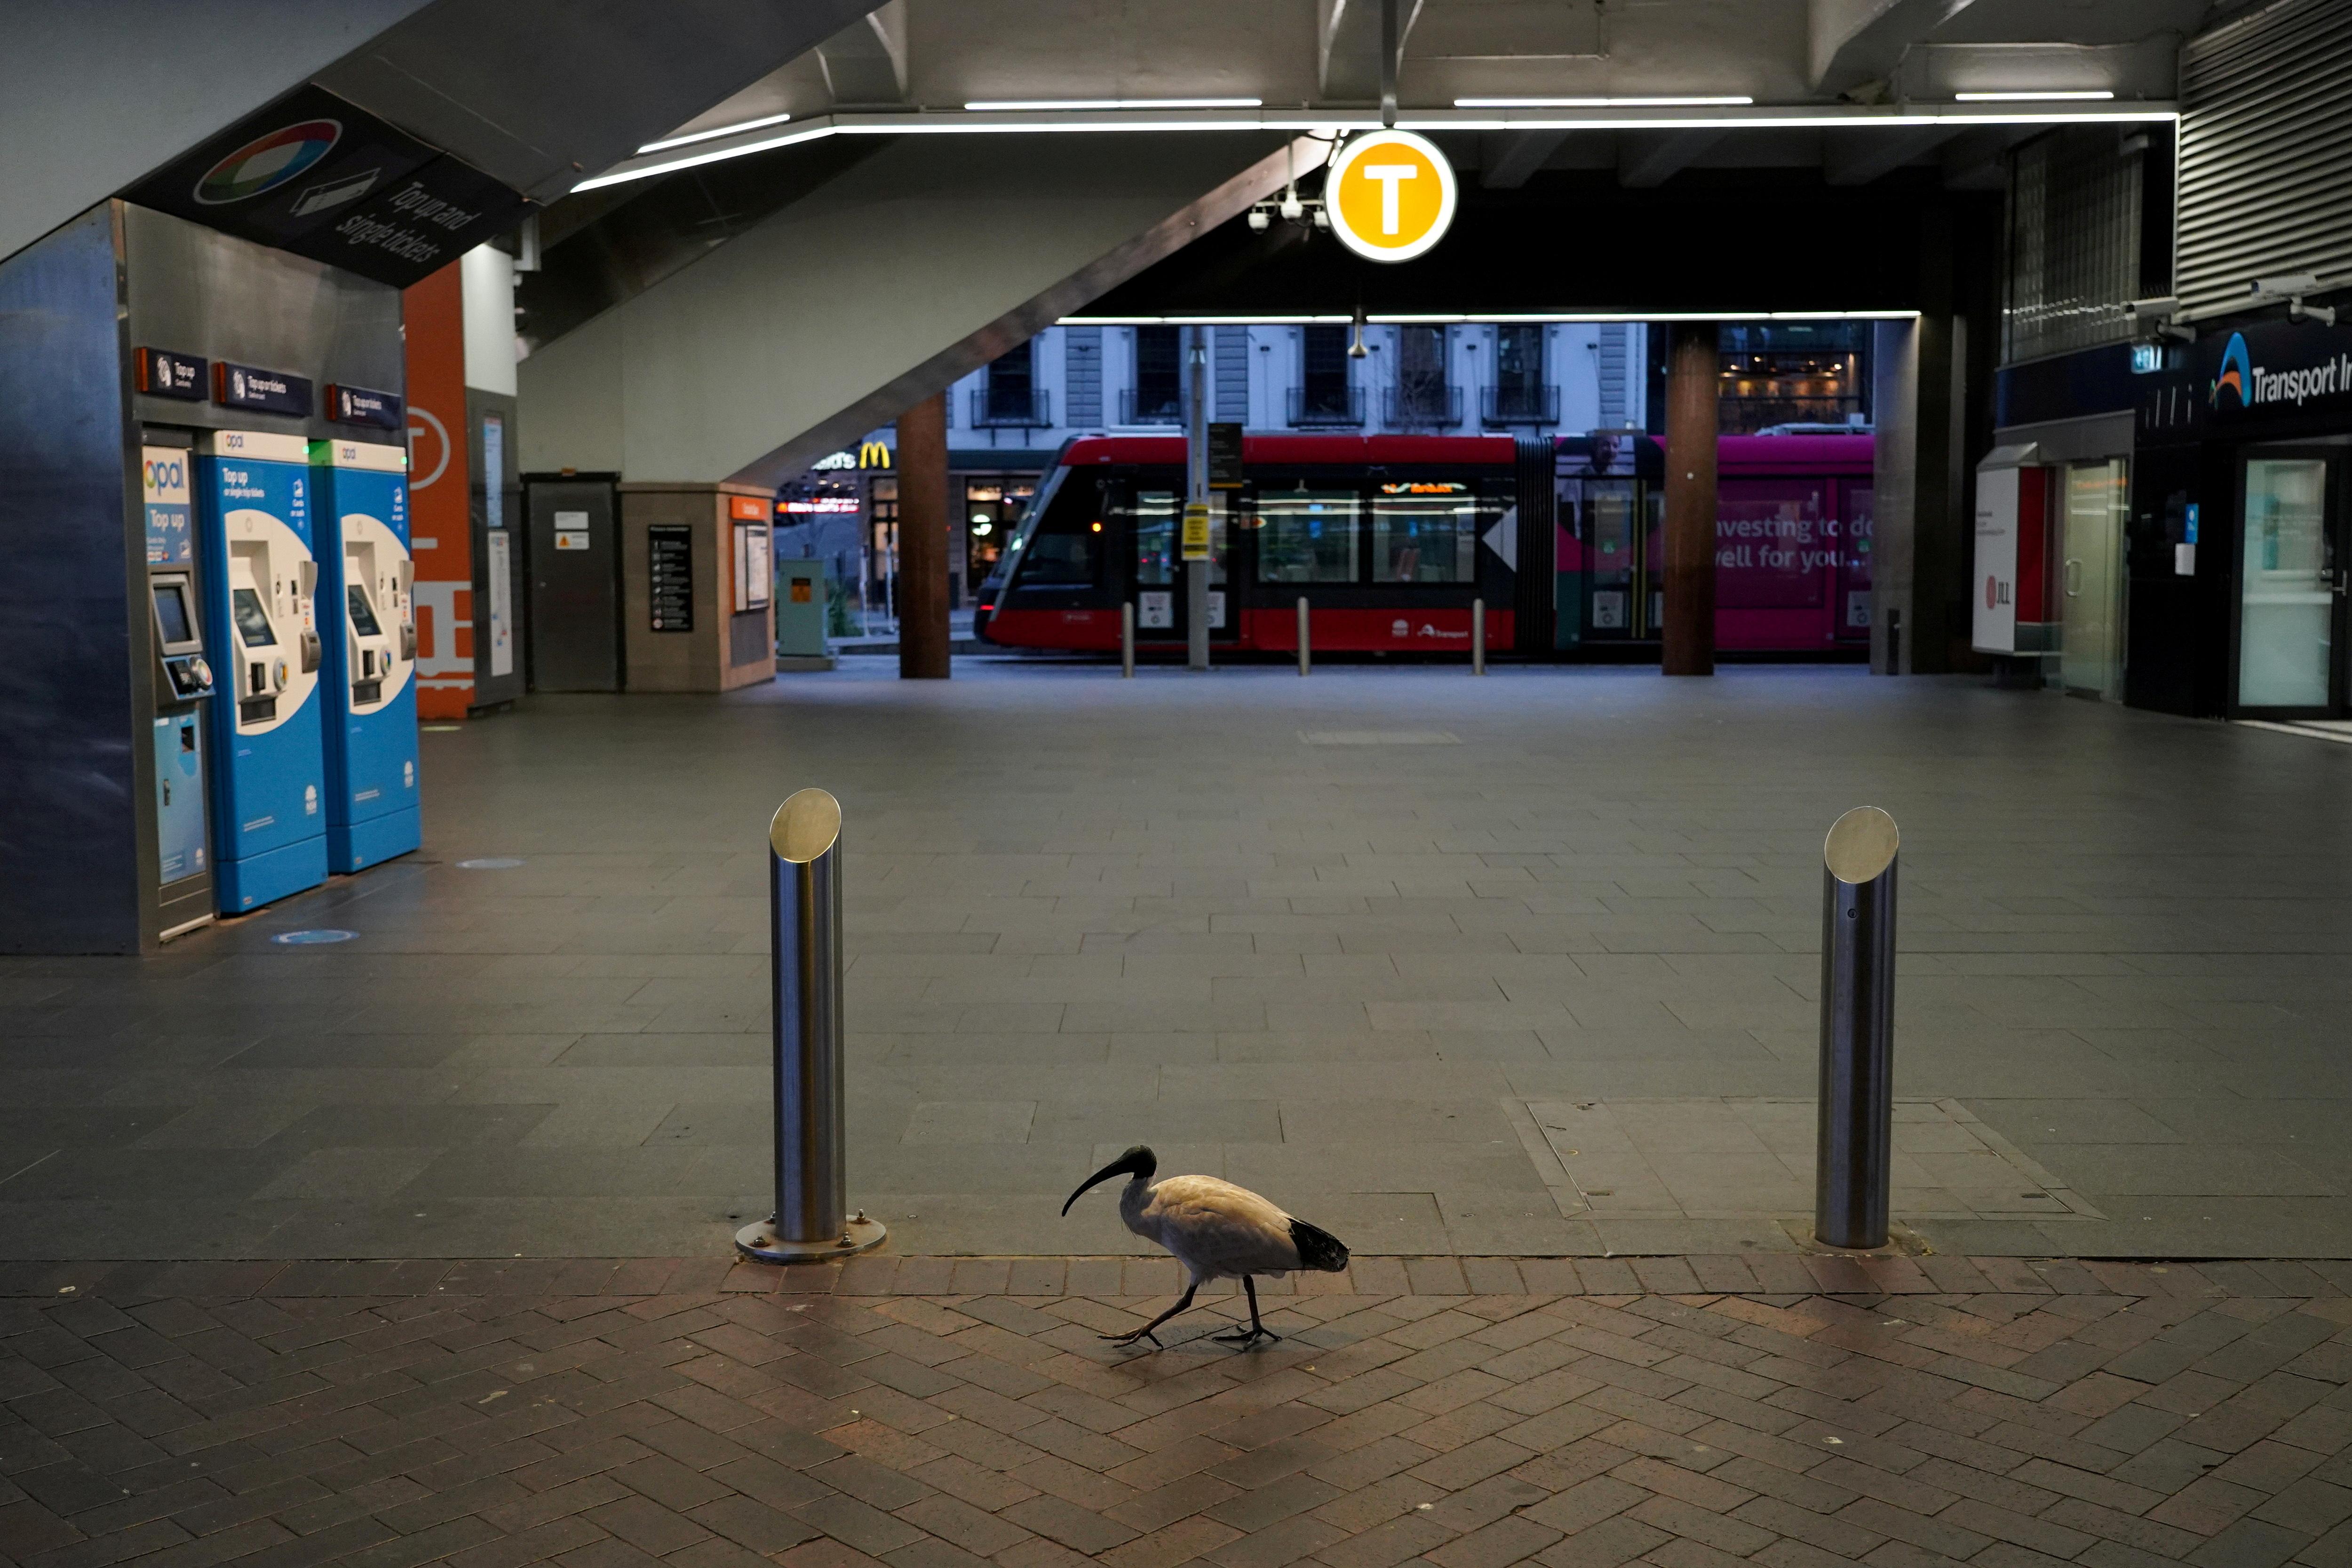 A lone bird walks past the quiet Circular Quay train station during a lockdown to curb the spread of a coronavirus disease (COVID-19) outbreak in Sydney, Australia, July 28, 2021.  REUTERS/Loren Elliott/File Photo